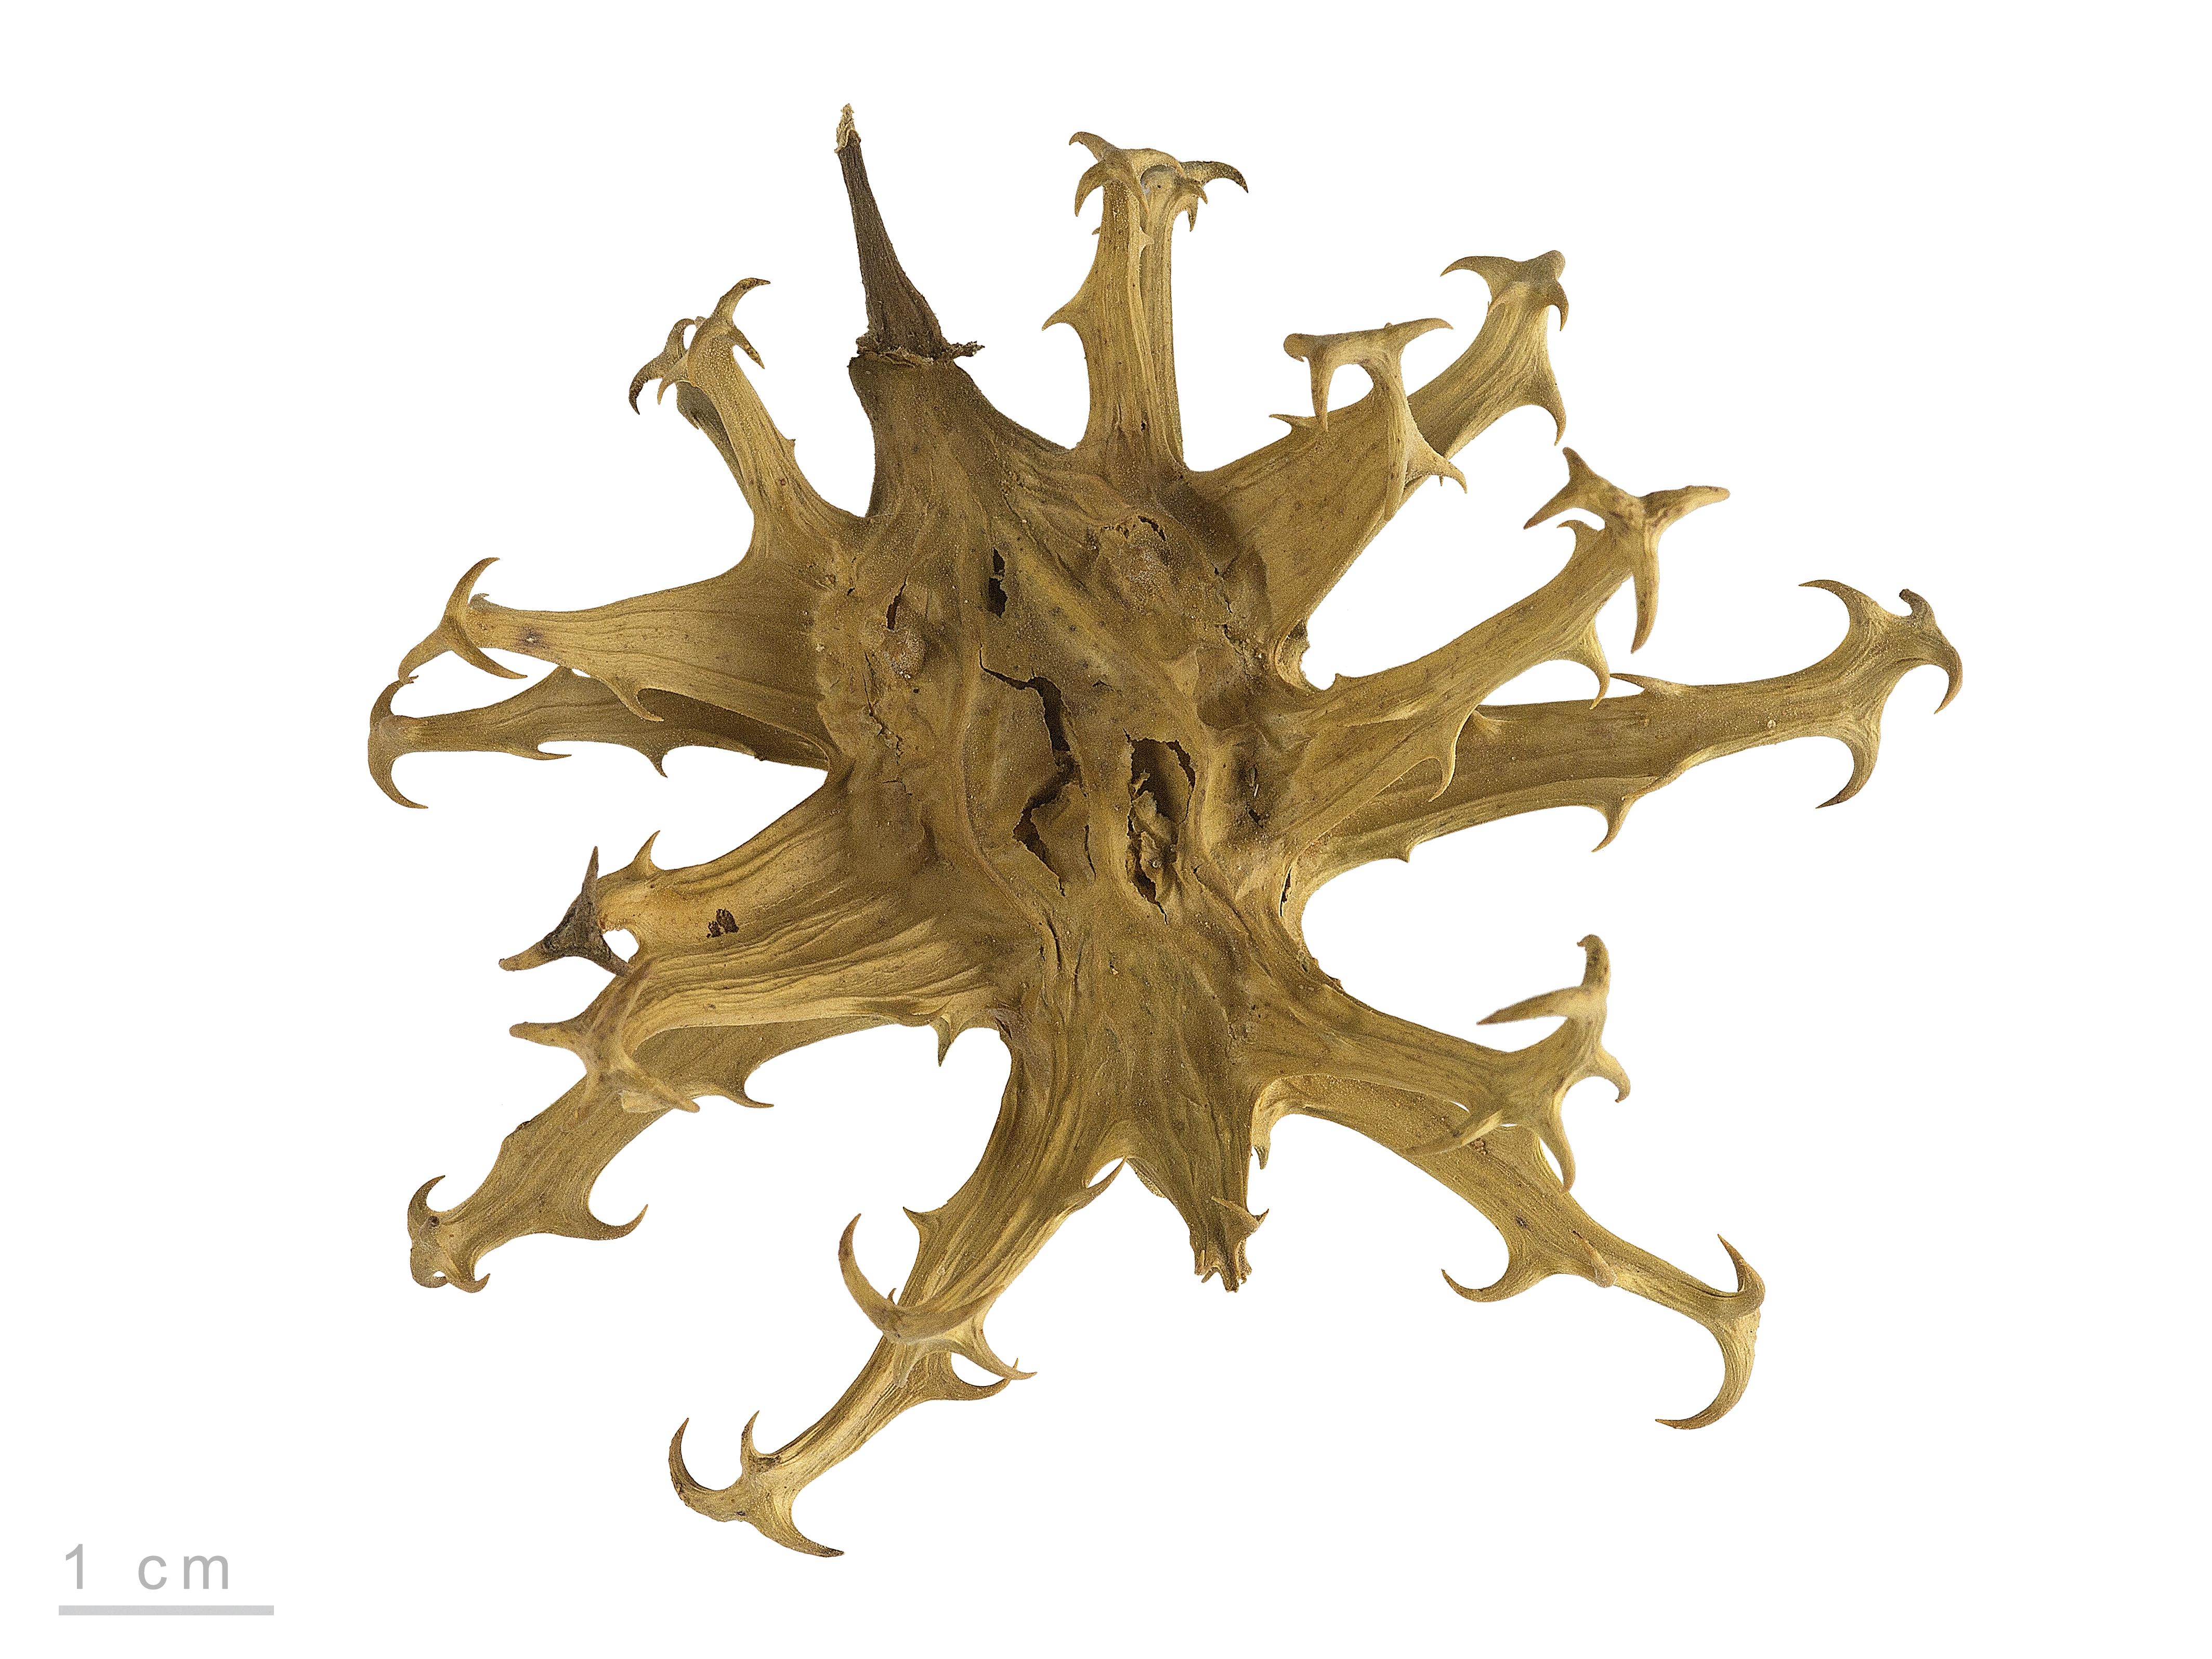 Fichier:Harpagophytum procumbens MHNT.BOT.2005.0.1243.jpg — Wikipédia